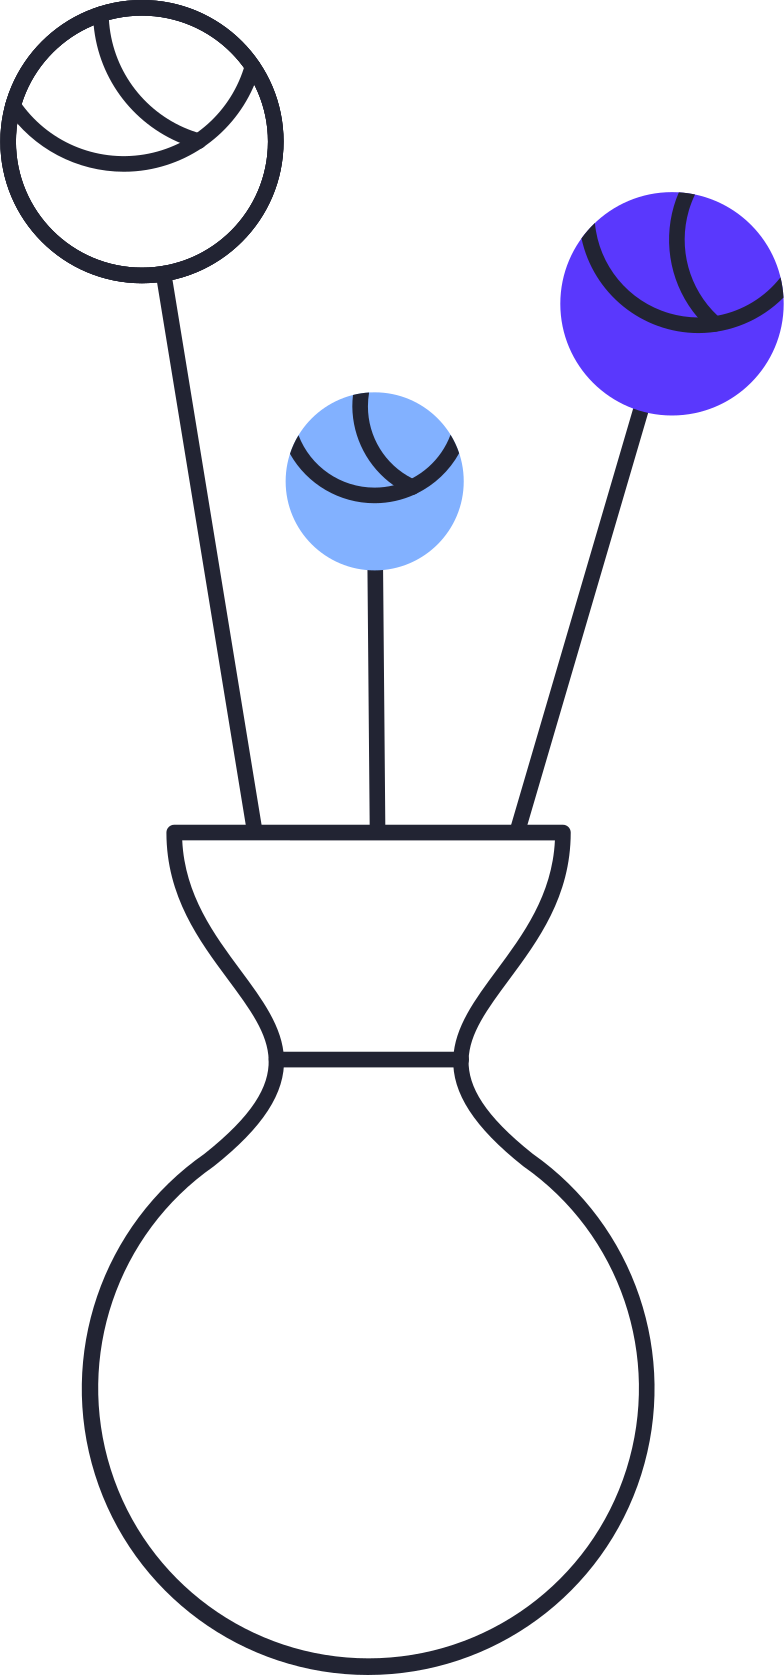 downloading  flowers in vase Clipart illustration in PNG, SVG